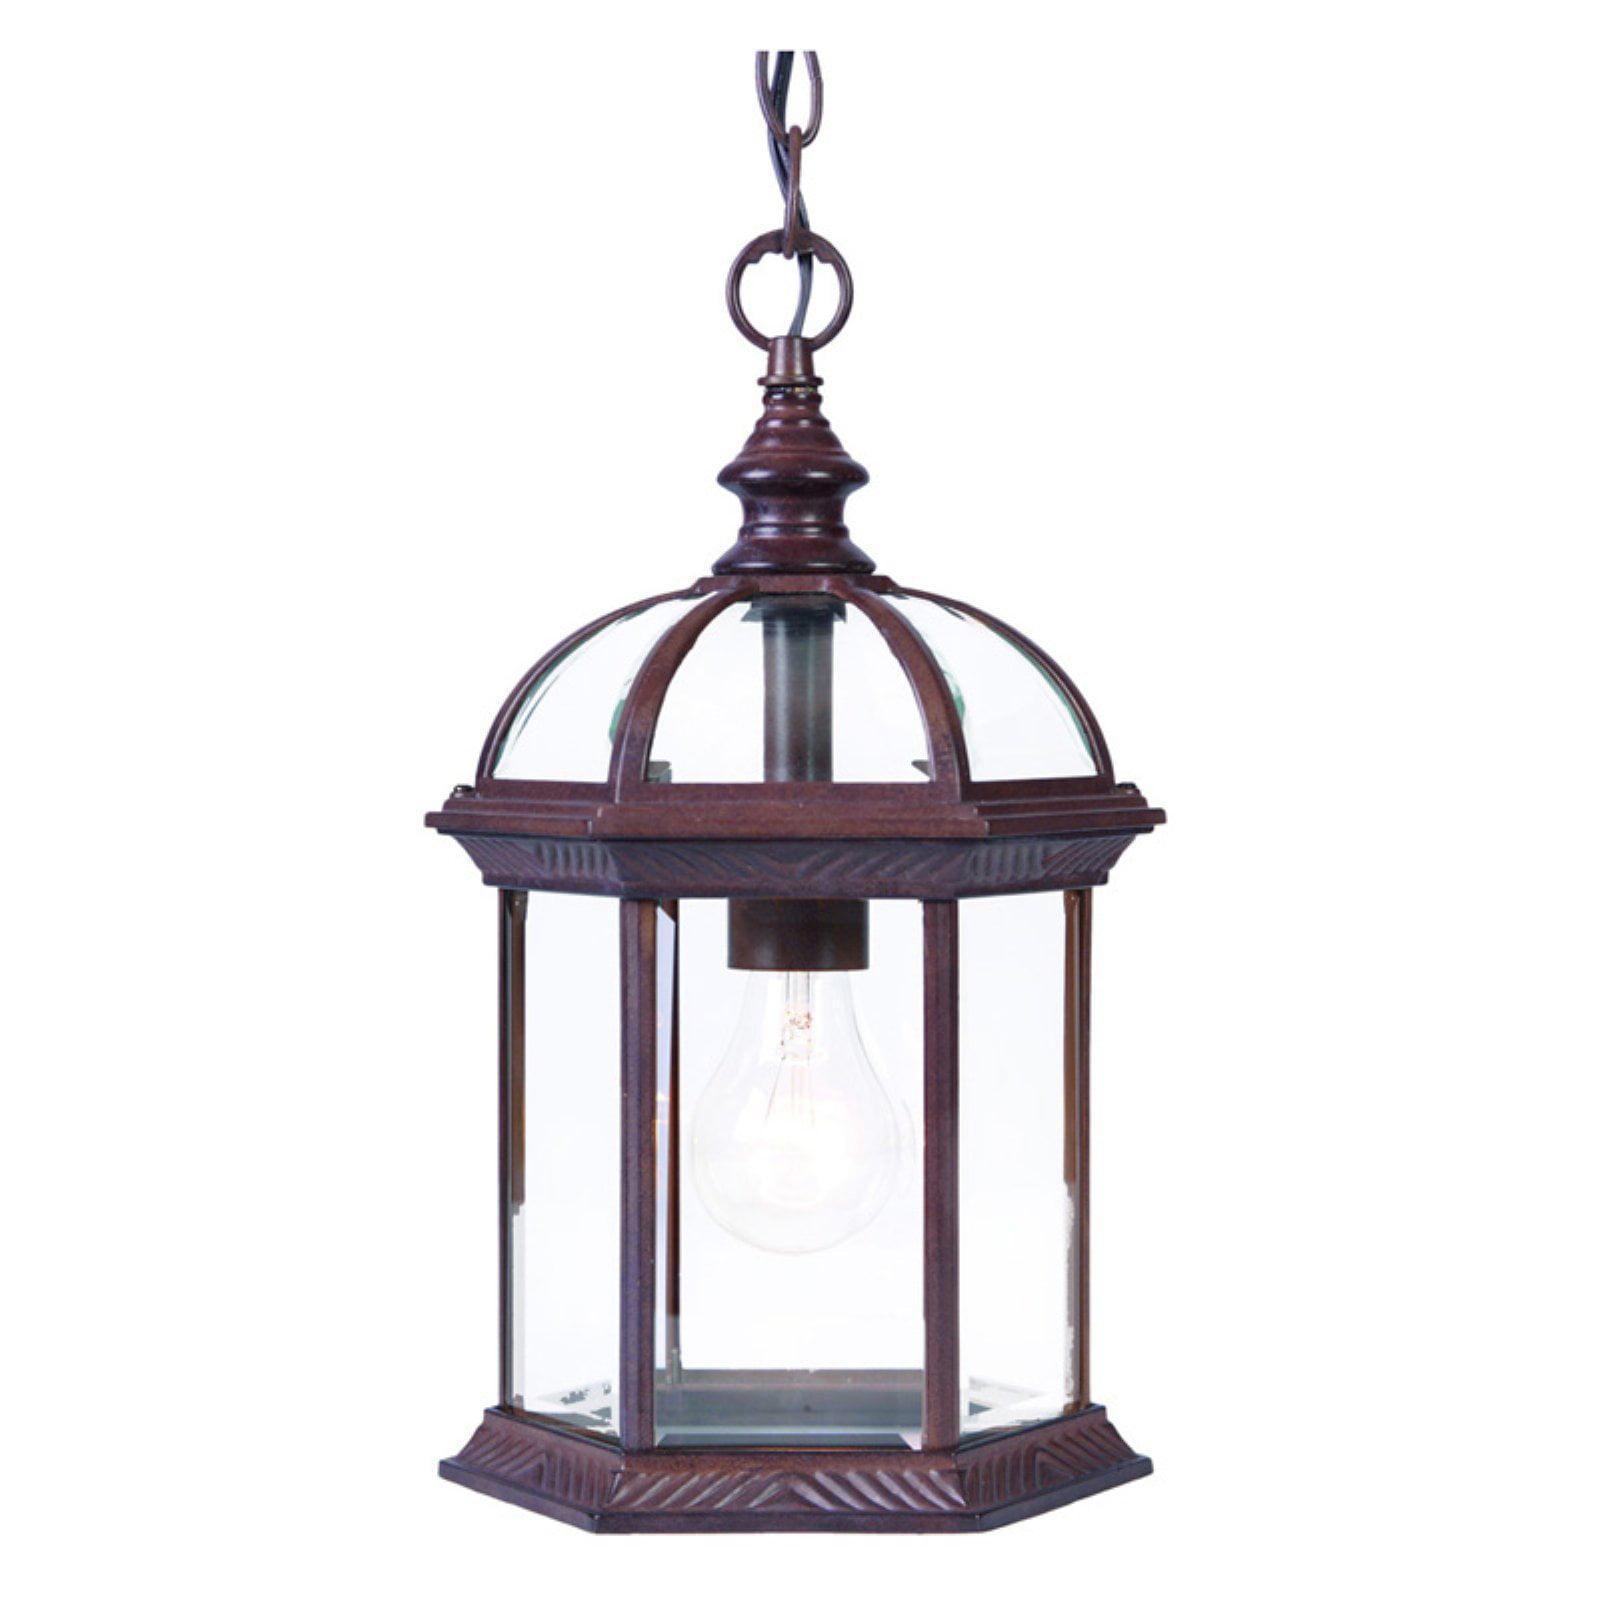 Acclaim Lighting Dover Outdoor Hanging Lantern Light Fixture